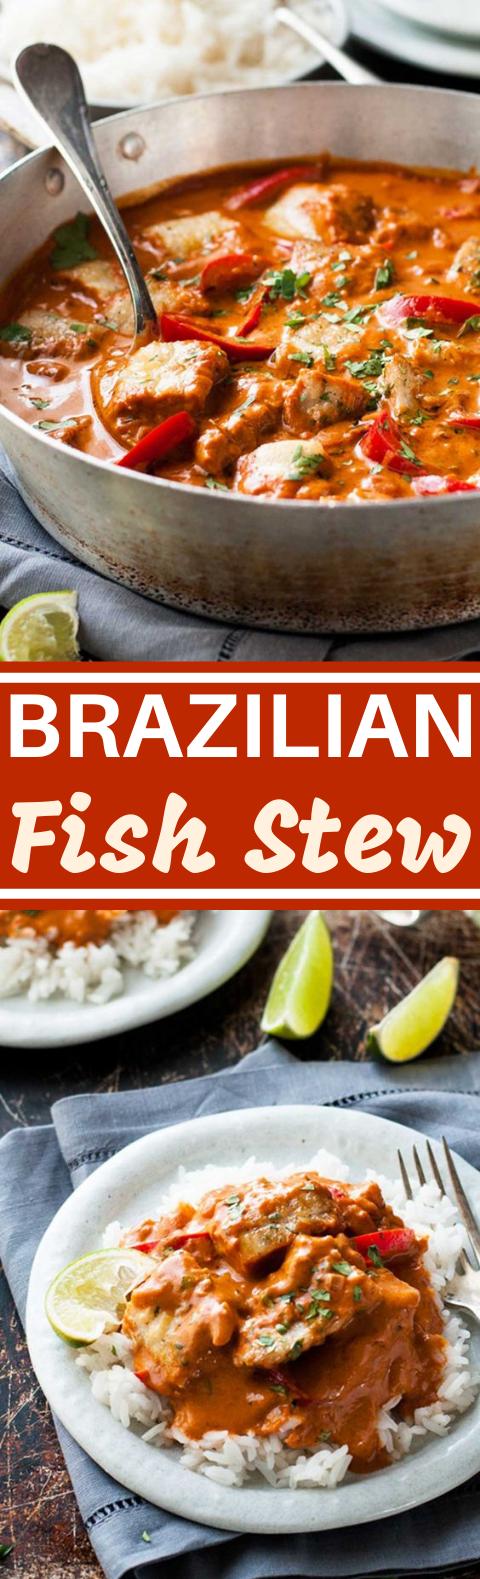 Brazilian Fish Stew (Moqueca Baiana) #lunch #dinner #seafood #recipes #stew